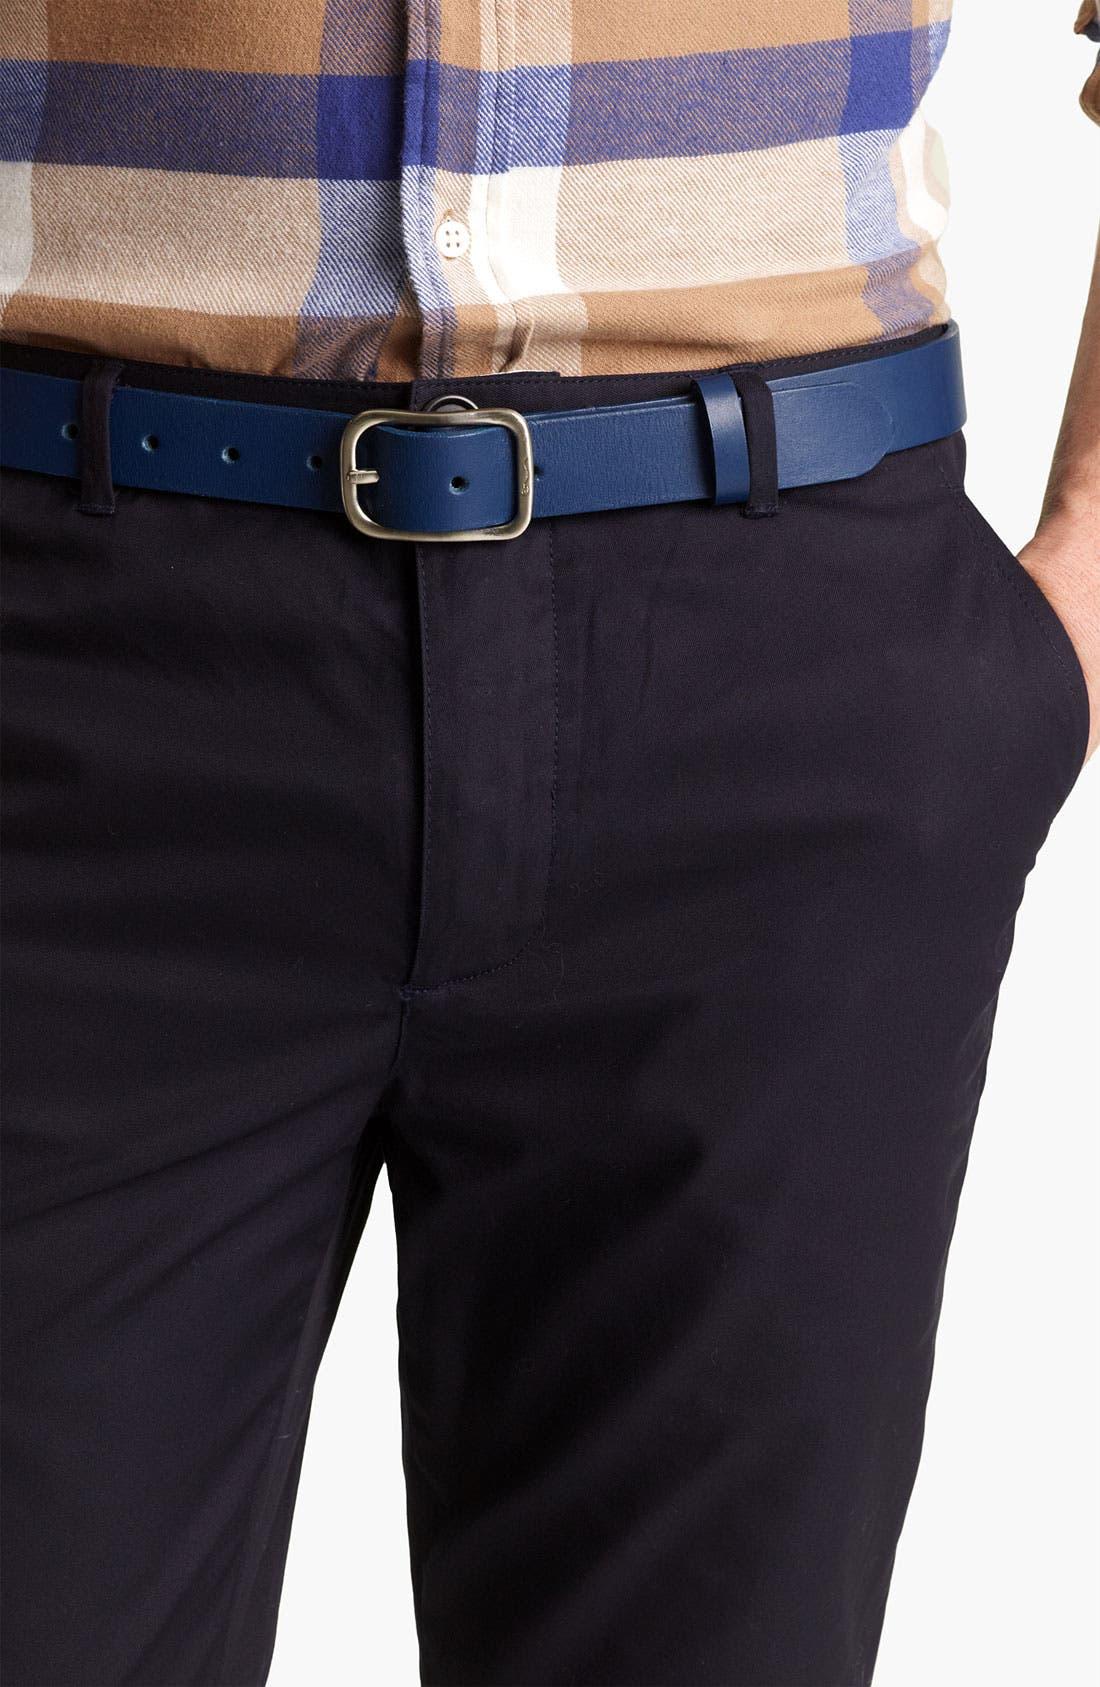 Main Image - Shipley & Halmos 'Cambridge' Leather Belt